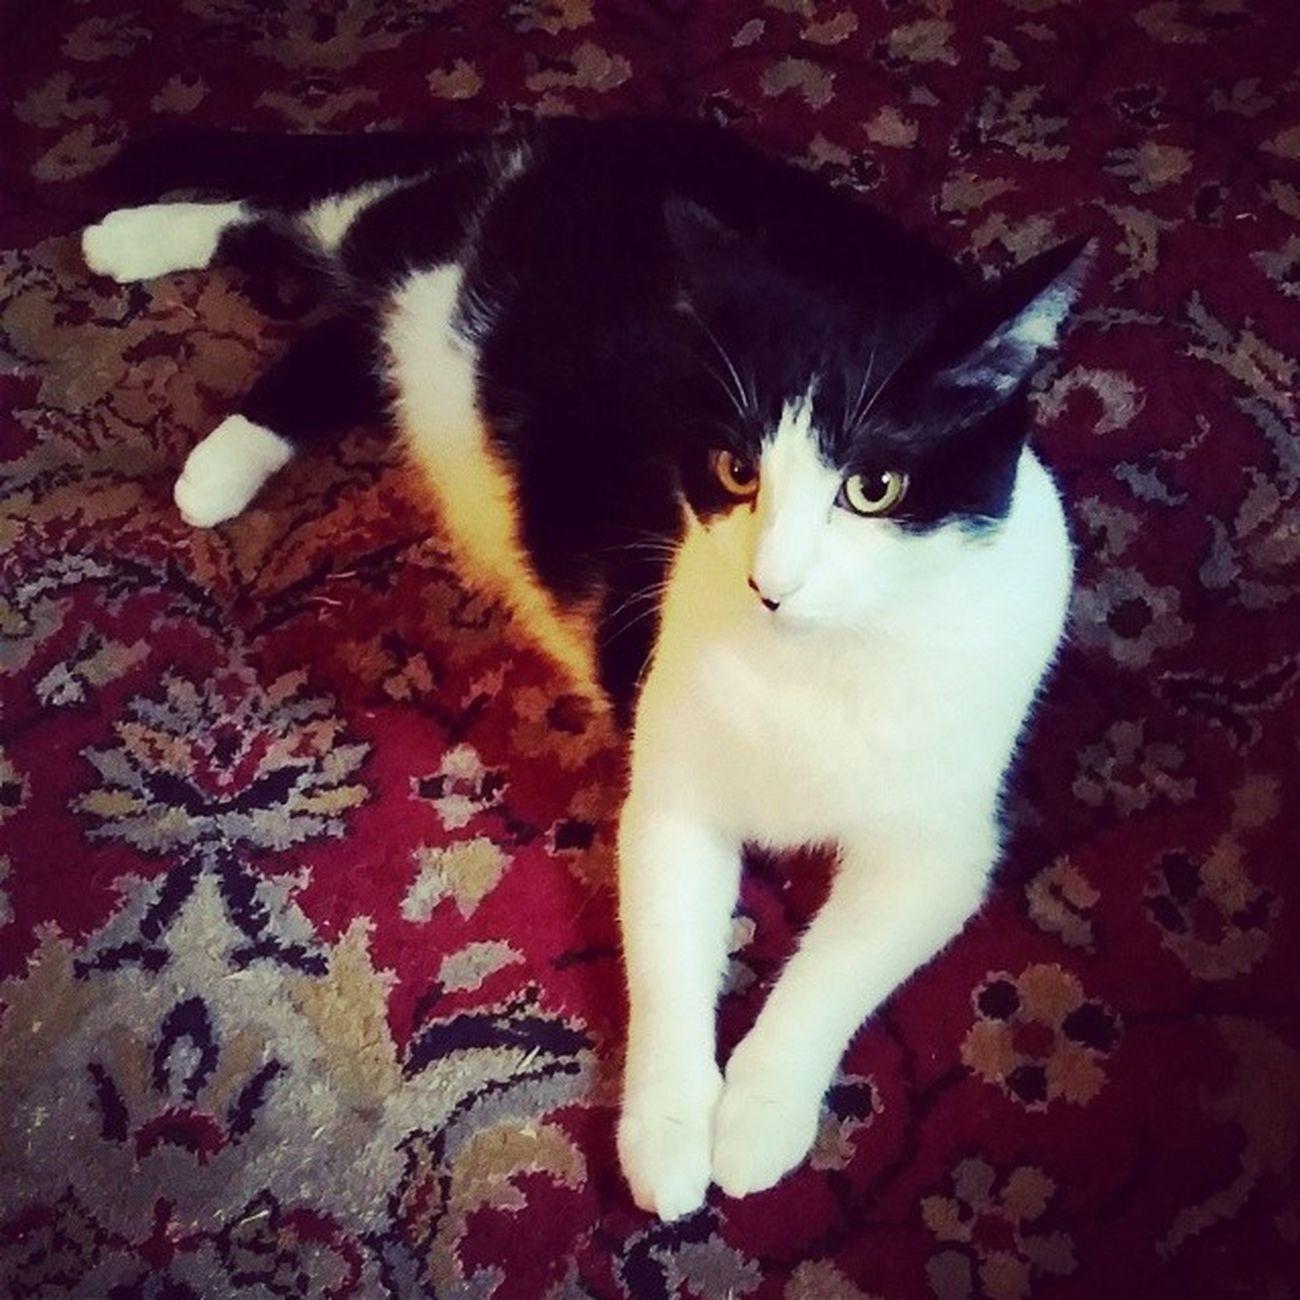 Cats Catsofinstagram Themingming Familiar blackandwhitecats lazycatdaze